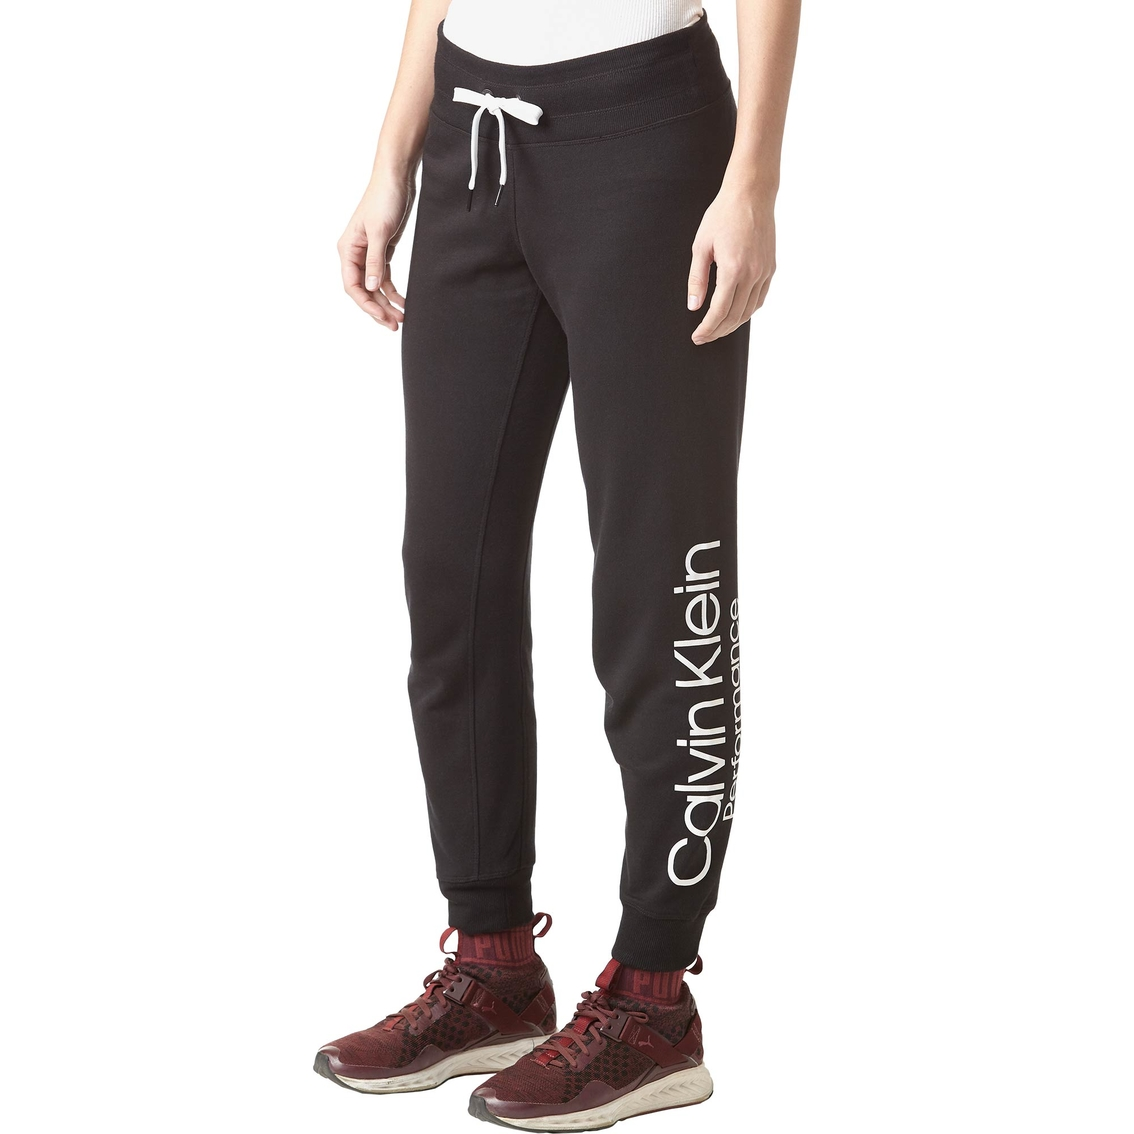 0bdeb8a8c28a Calvin Klein Rib Waistband Jogger Pants